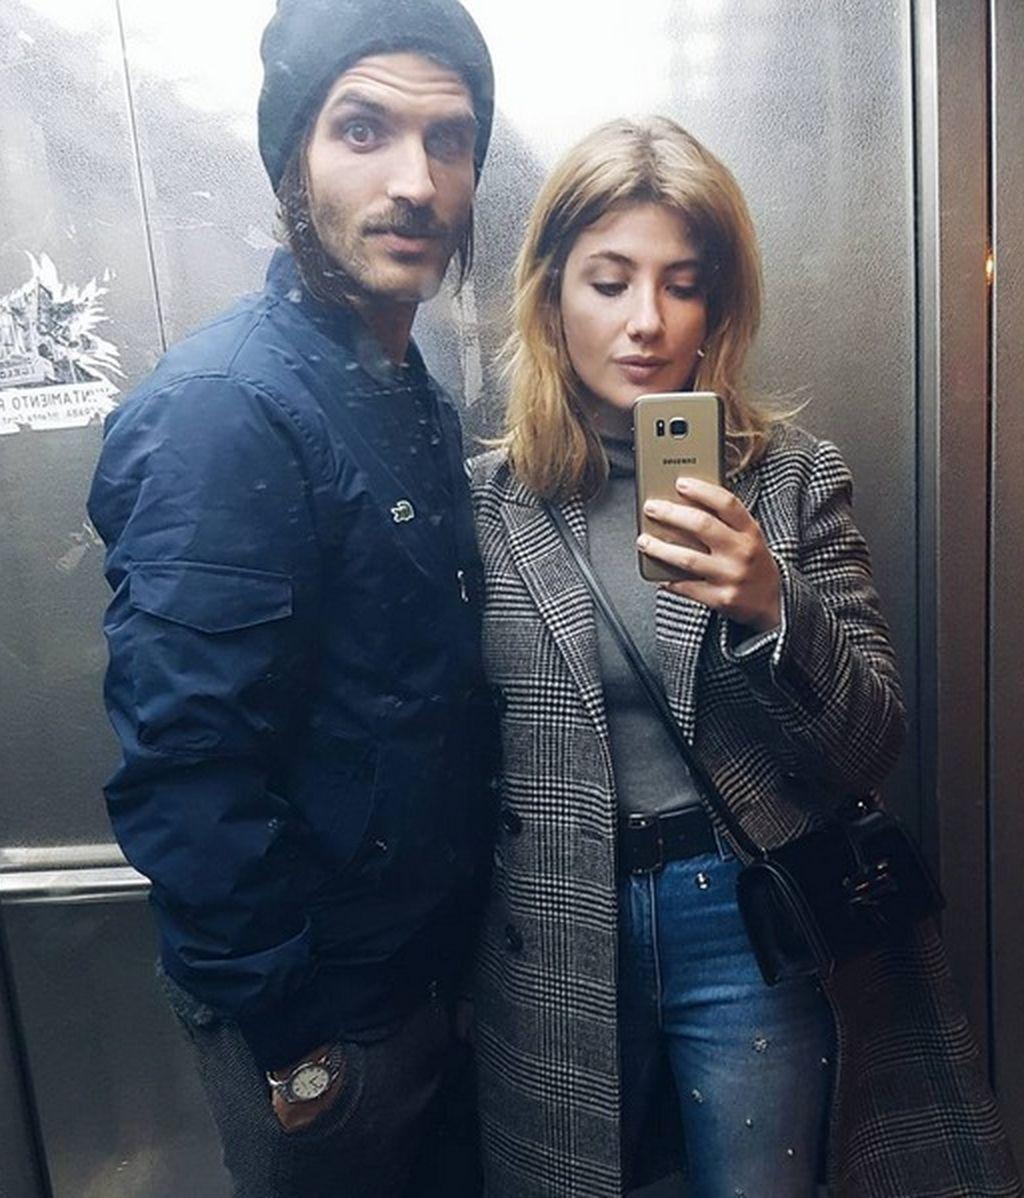 Miriam Giovanelli y Xabi Ortega